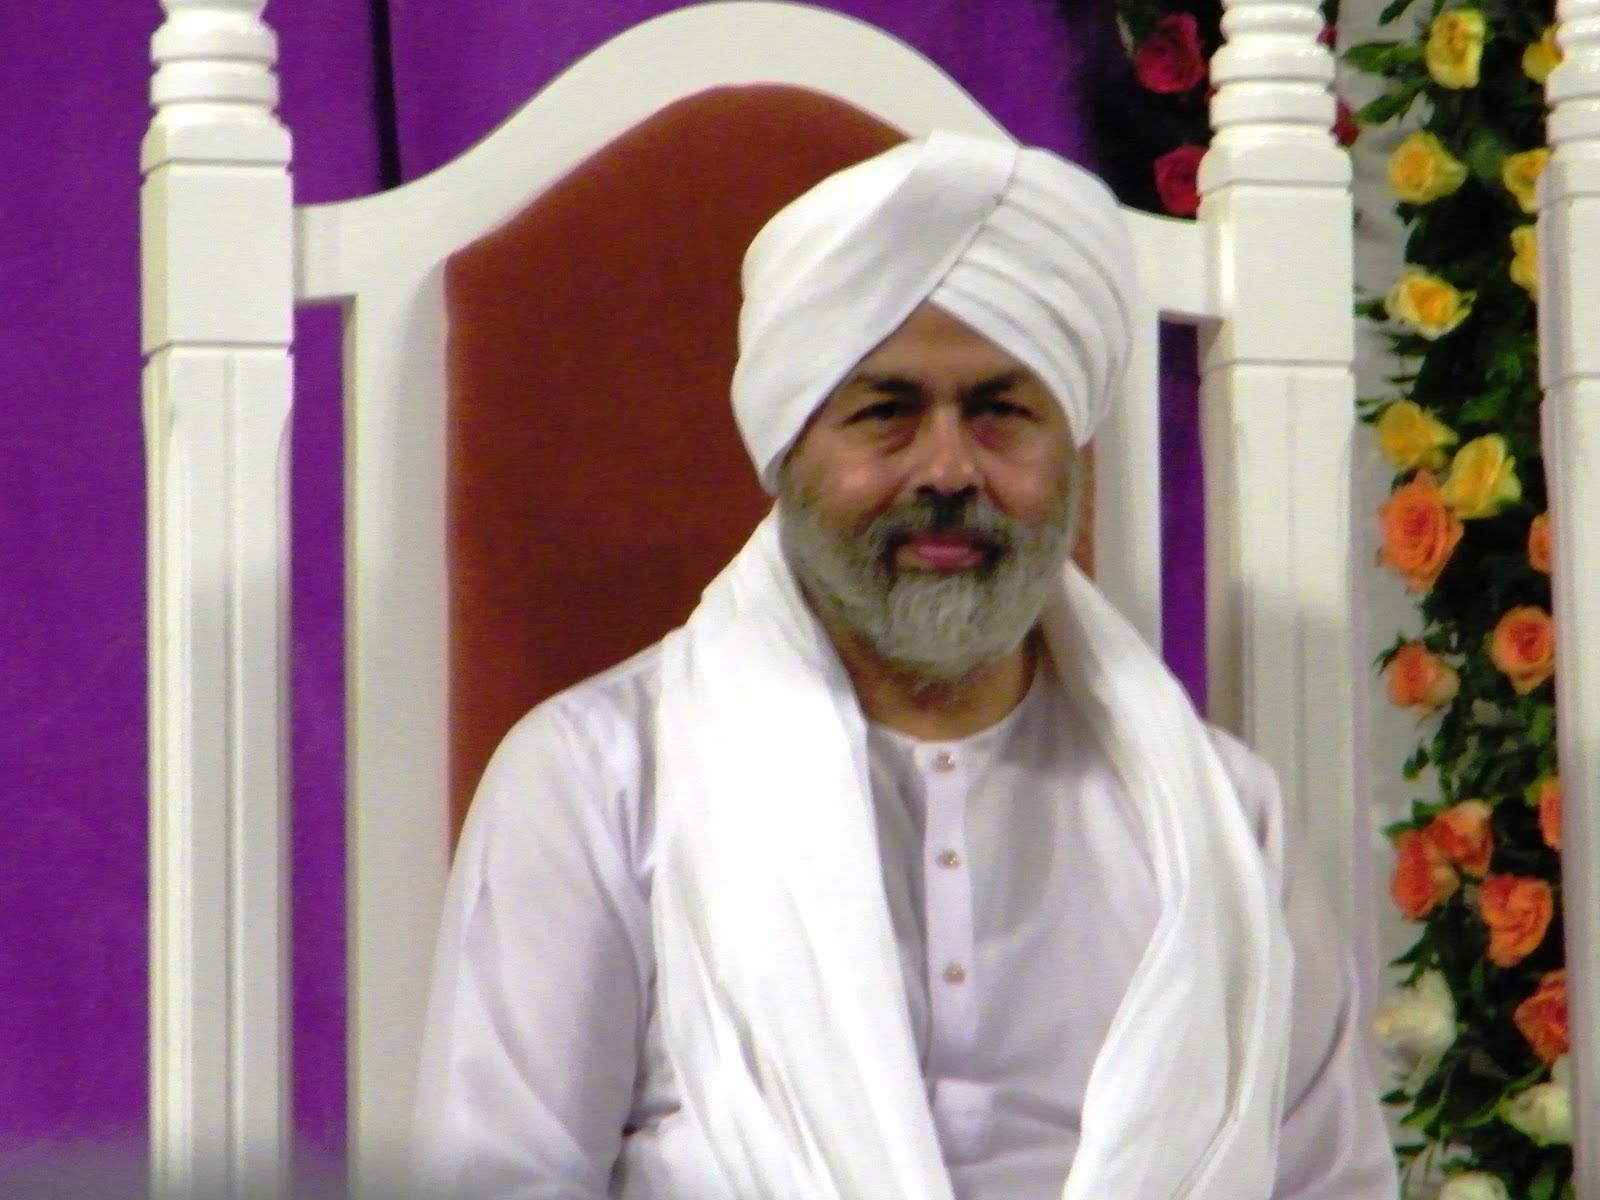 sant nirankari mission Latest news up samagam to be held in varanasi salvation tour by satguru mata ji, maharashtra and madhya pradesh voice divine -march 2018 -episode.